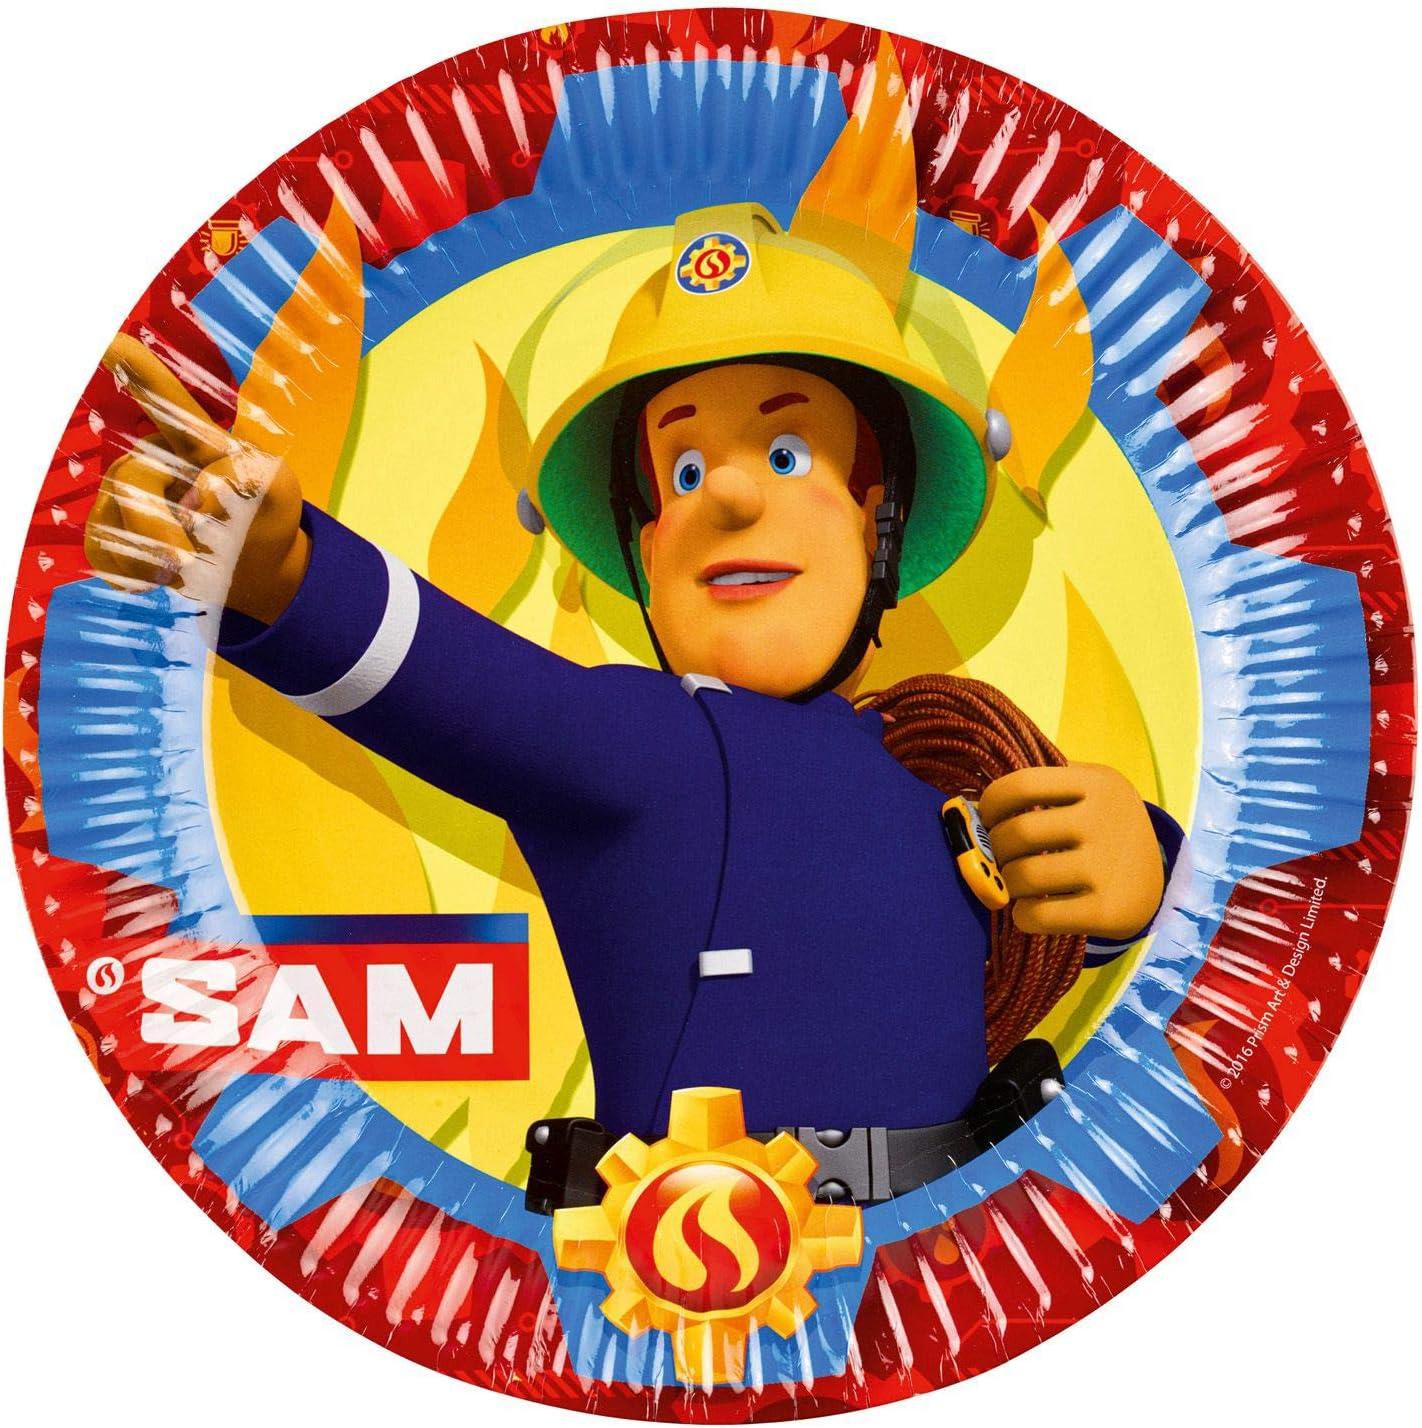 amscan 11012077 Round Paper Plates with Fireman Sam Design-8 Pcs